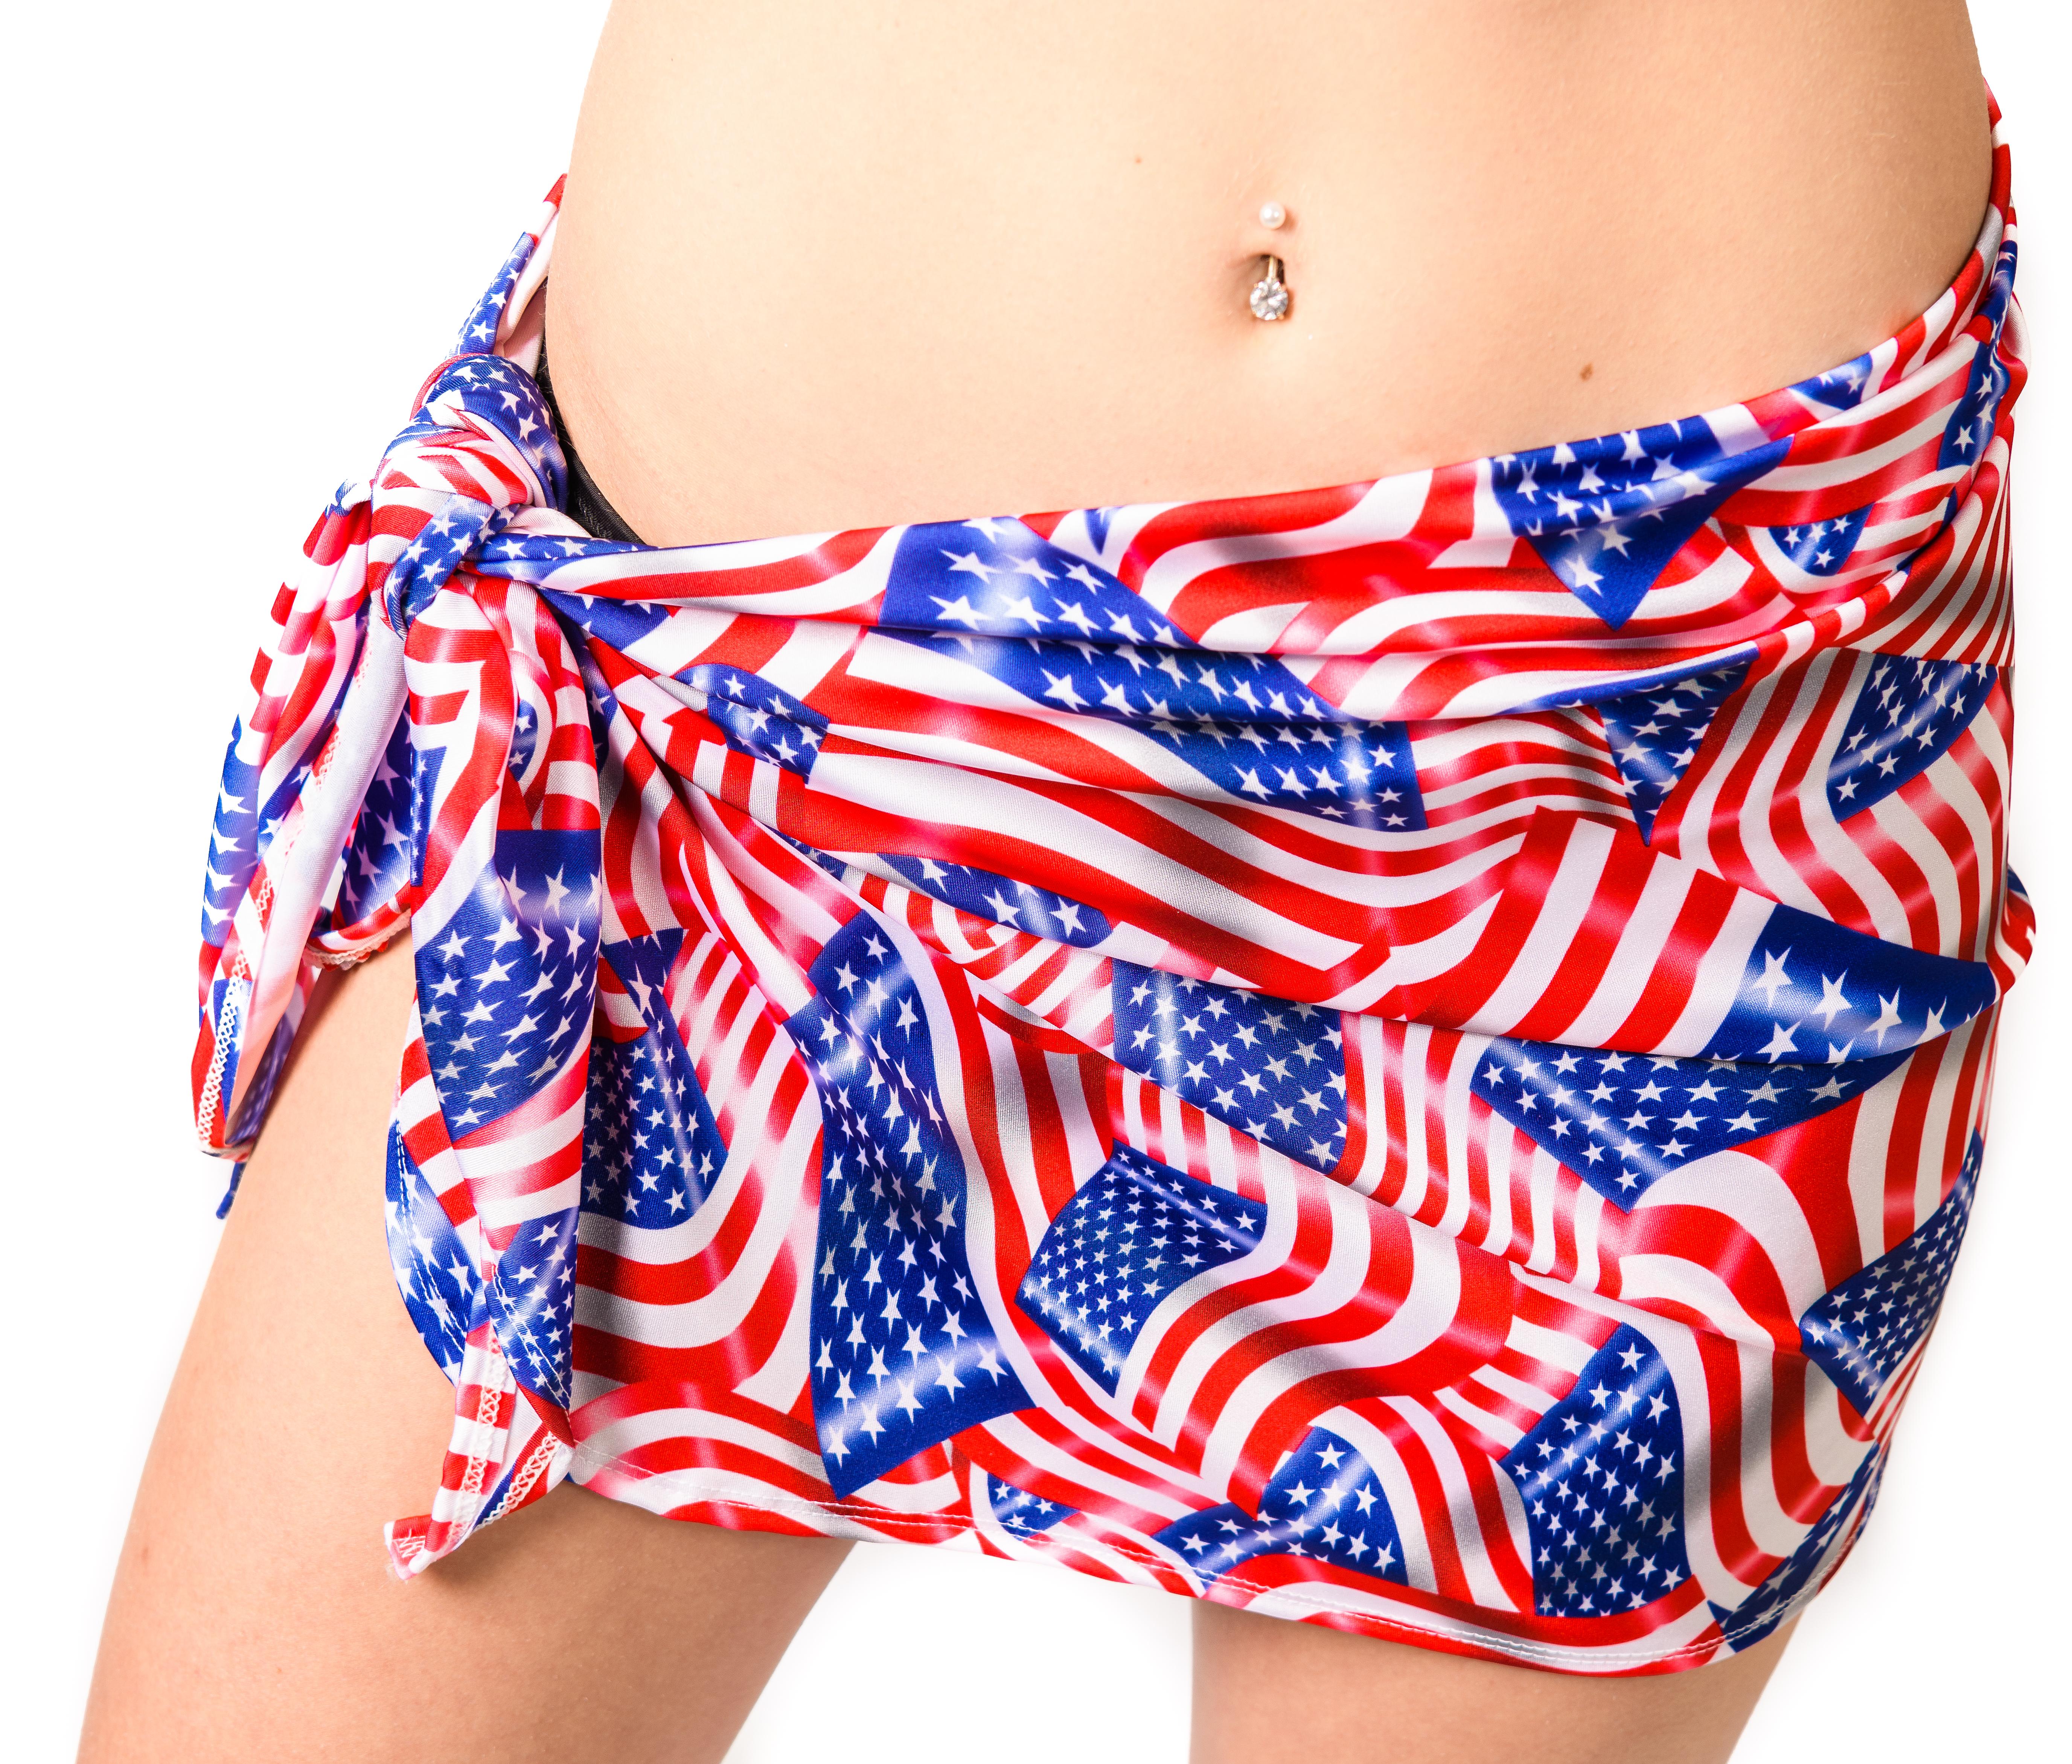 82f8b6ad115 Short Beach Cover Up Beach Skirt Sarong American Patriotic Flag ...